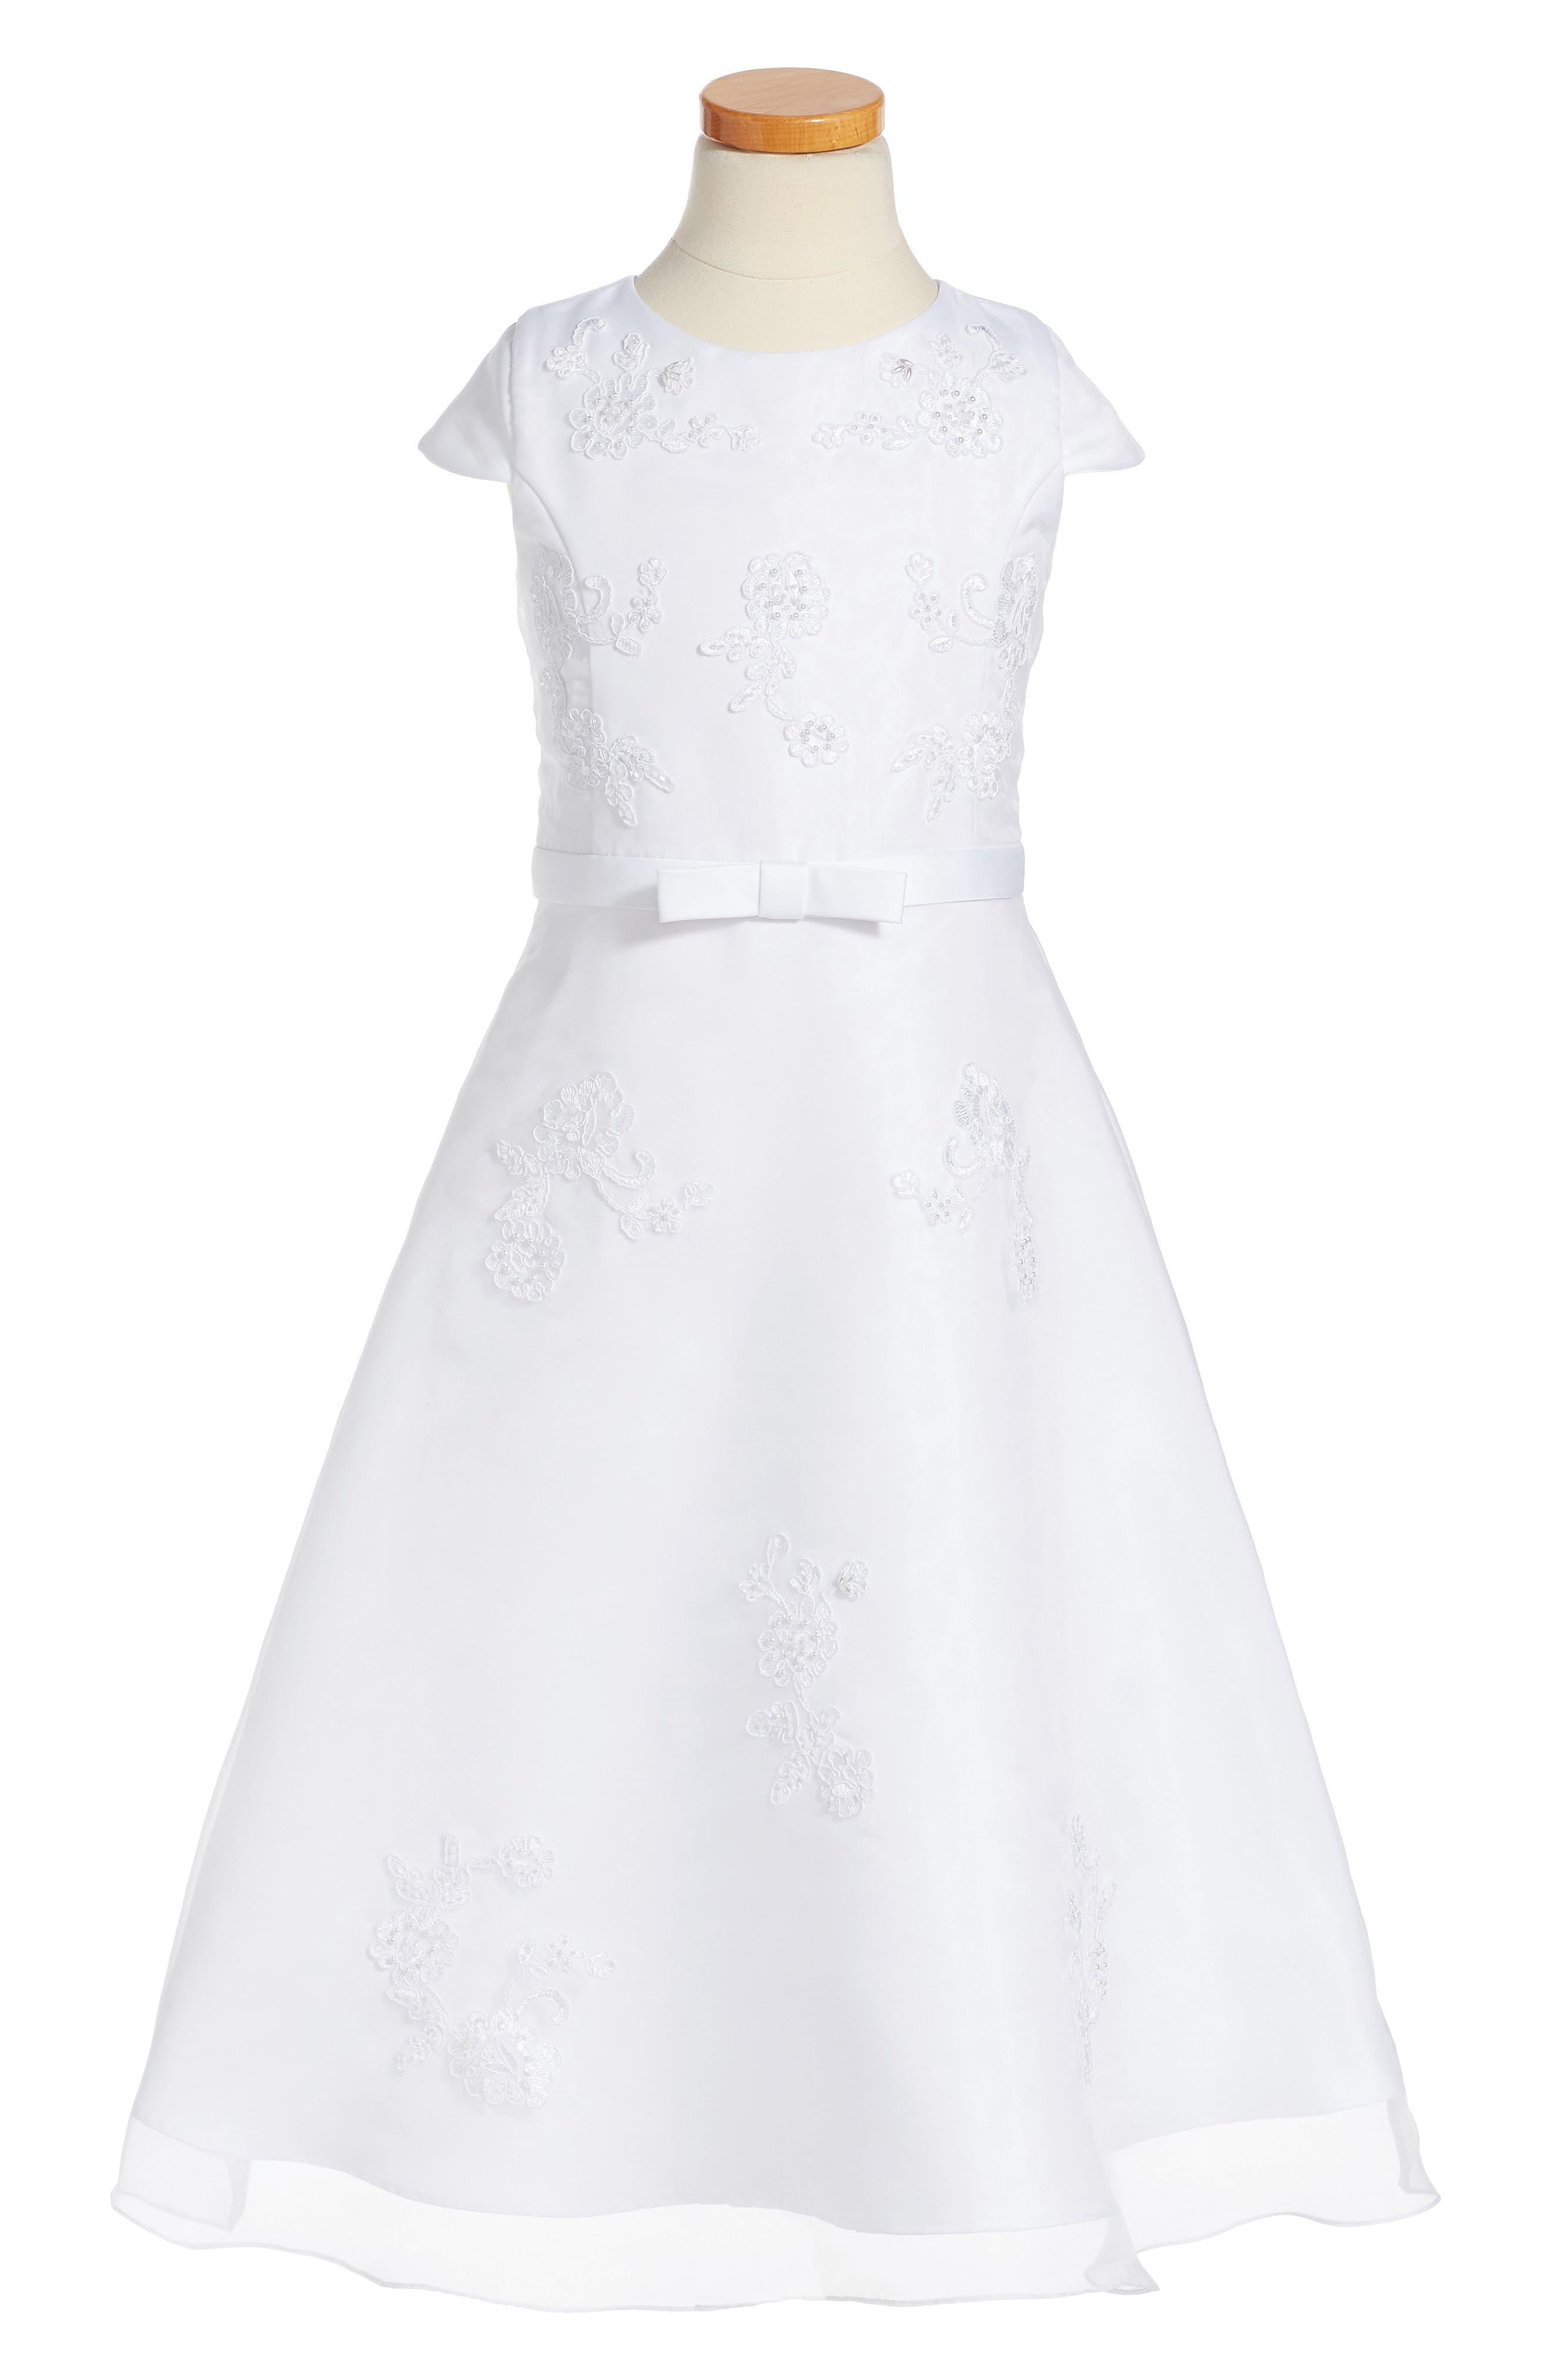 Main Image - Us Angels Lace Floral Fit & Flare Dress (Little Girls & Big Girls)